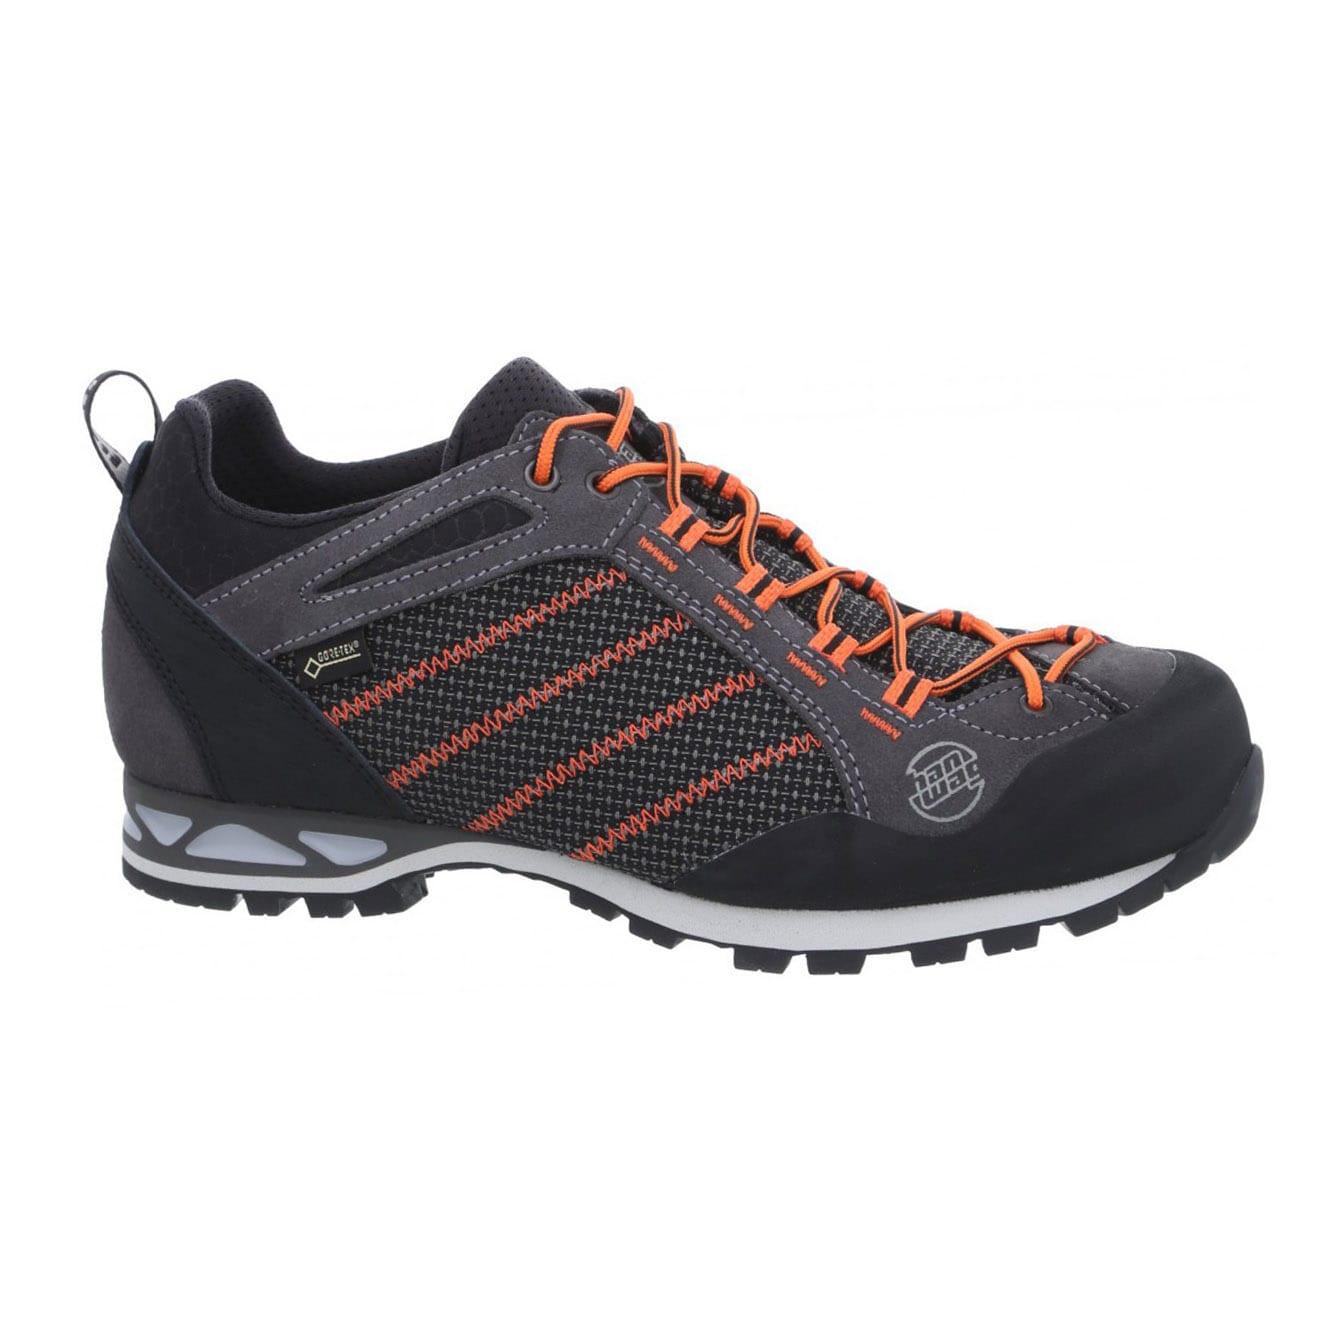 Hanwag makra low GTX boots asphalt orange